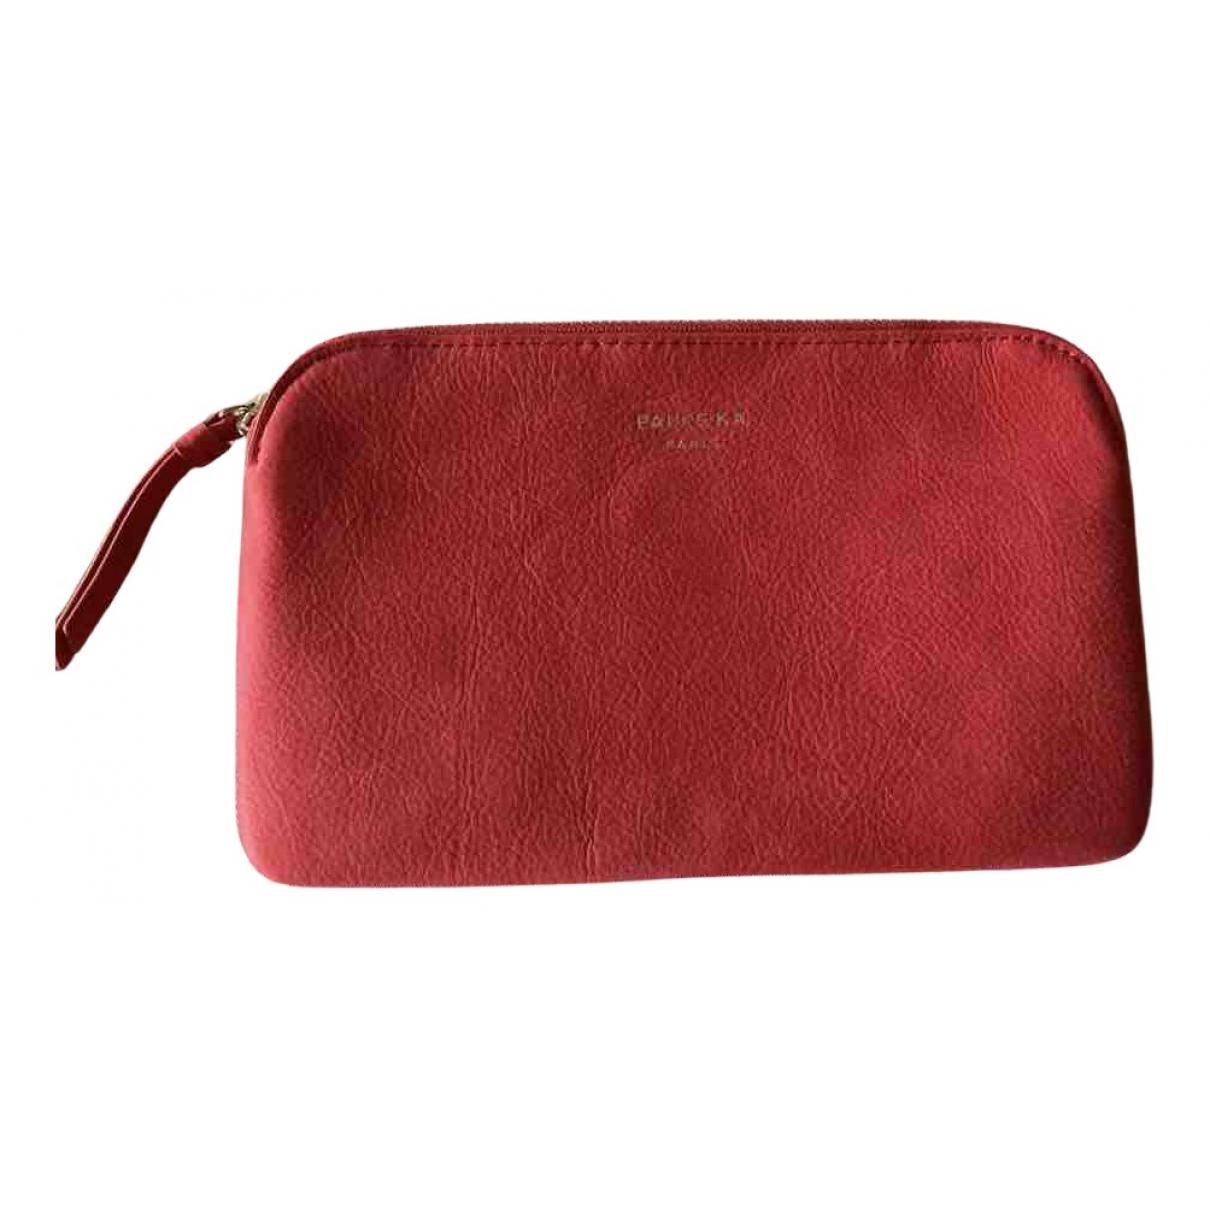 Paule Ka - Petite maroquinerie   pour femme en cuir - rose